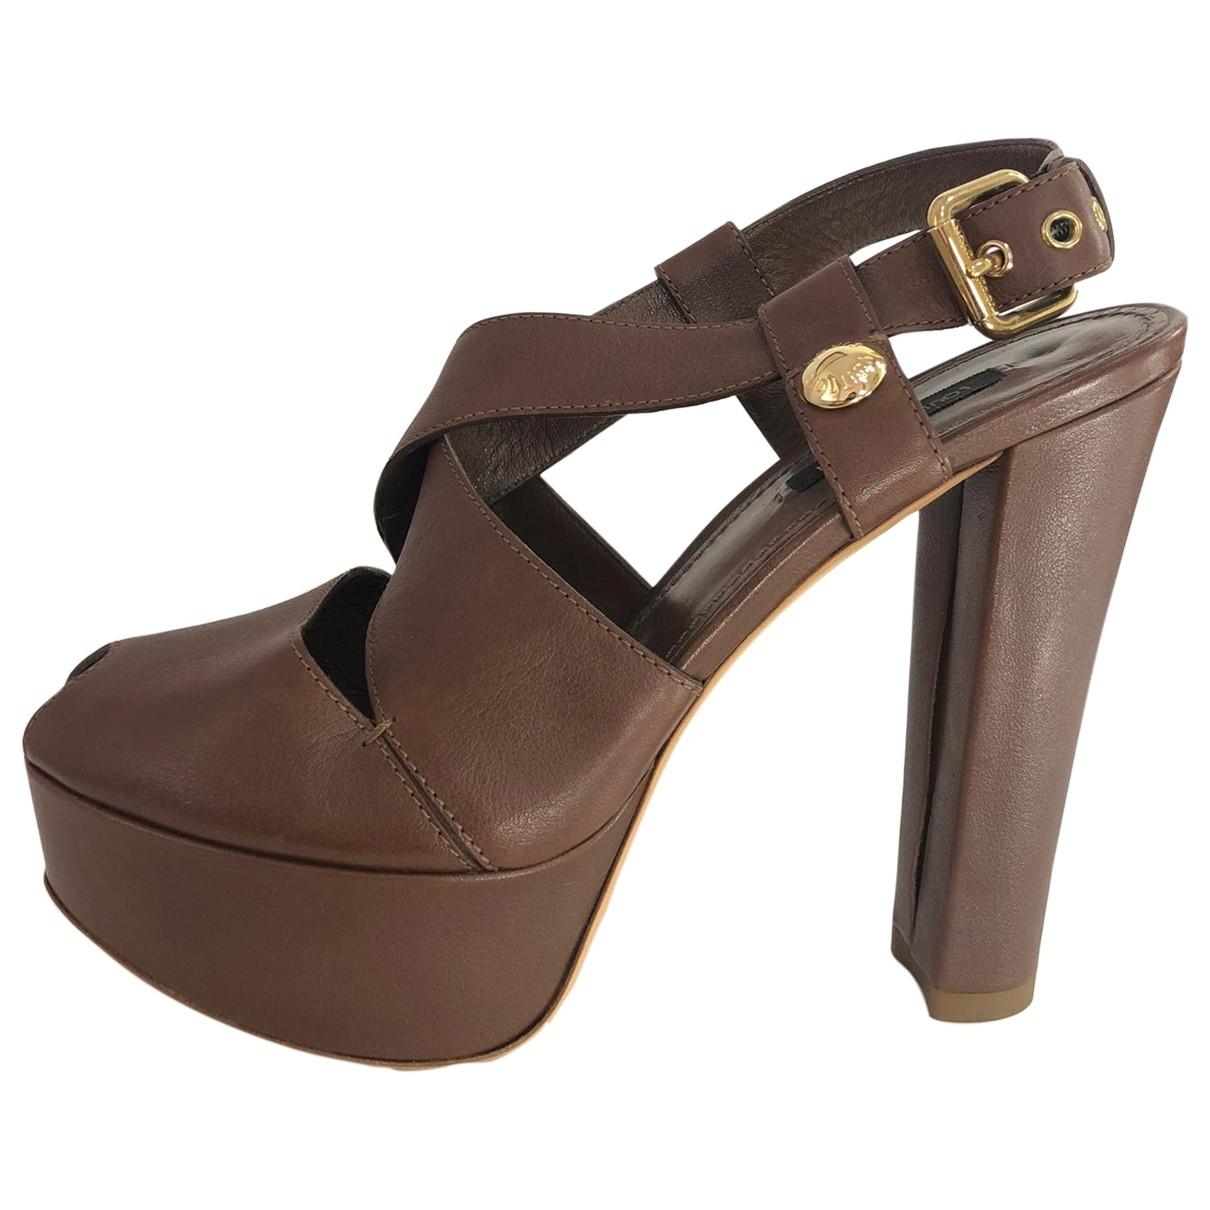 Louis Vuitton \N Brown Leather Sandals for Women 37.5 EU